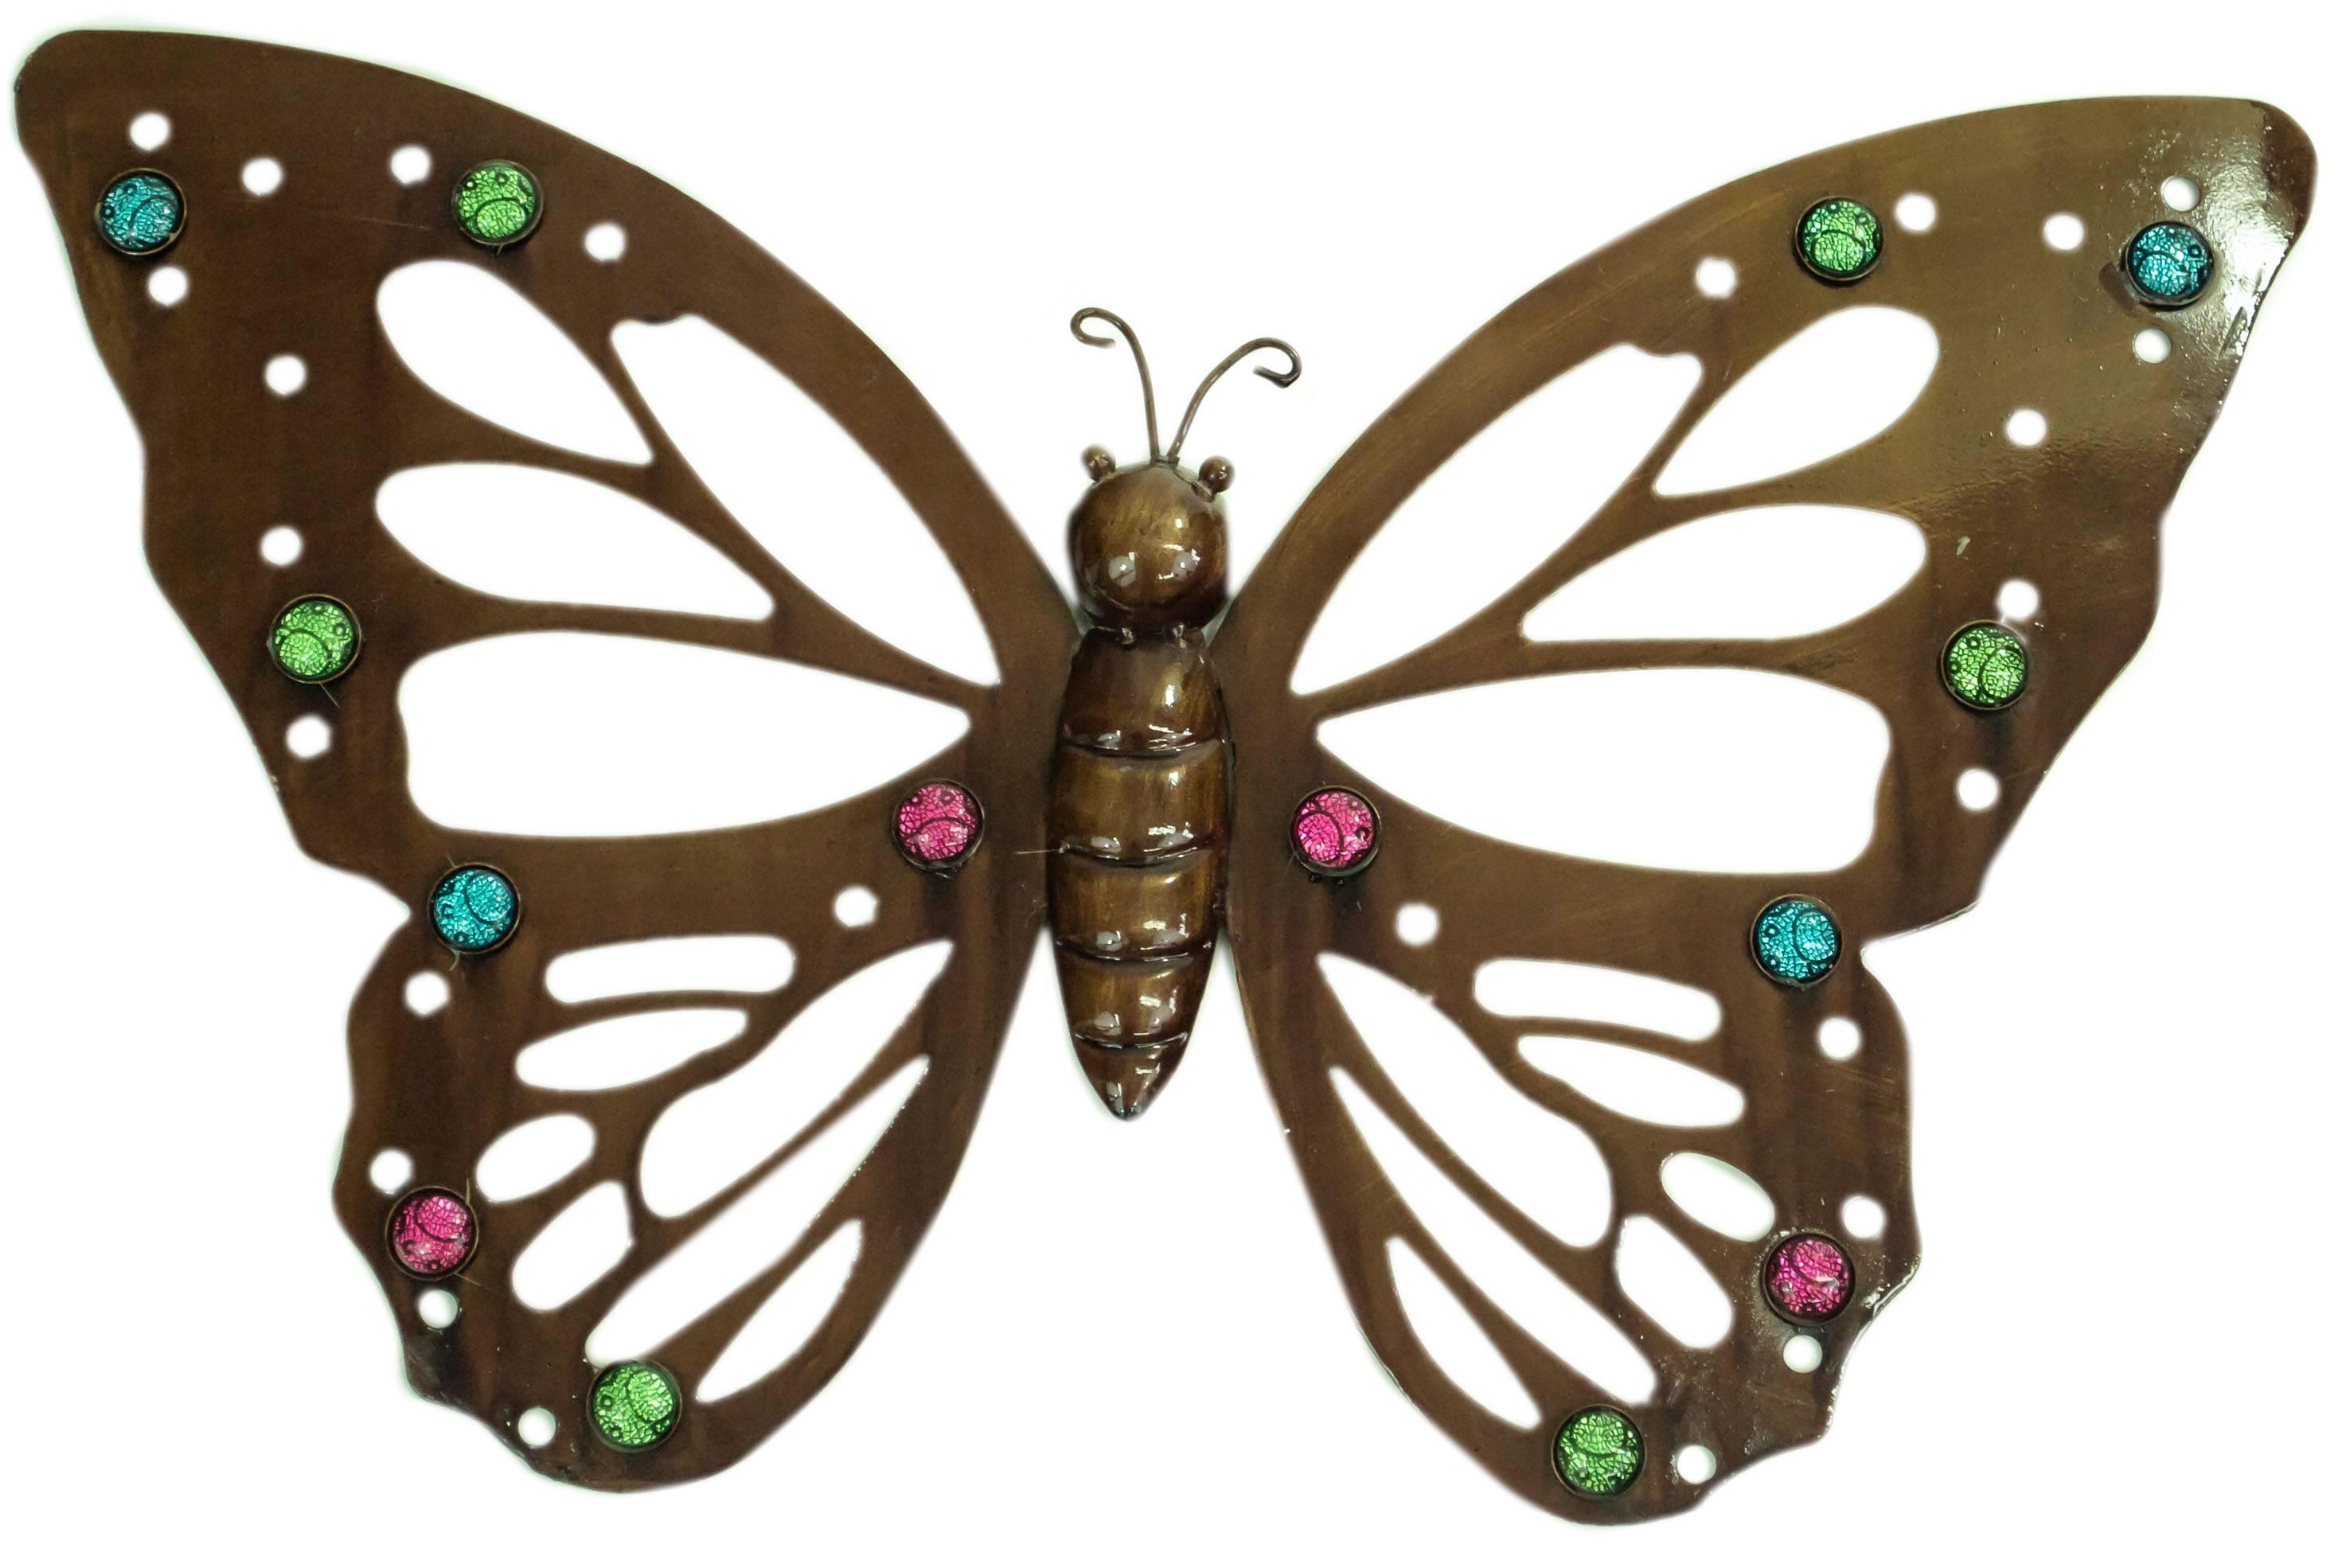 Cream Metal Butterfly Wall Art | Wallartideas Pertaining To Recent Cream Metal Wall Art (View 11 of 20)